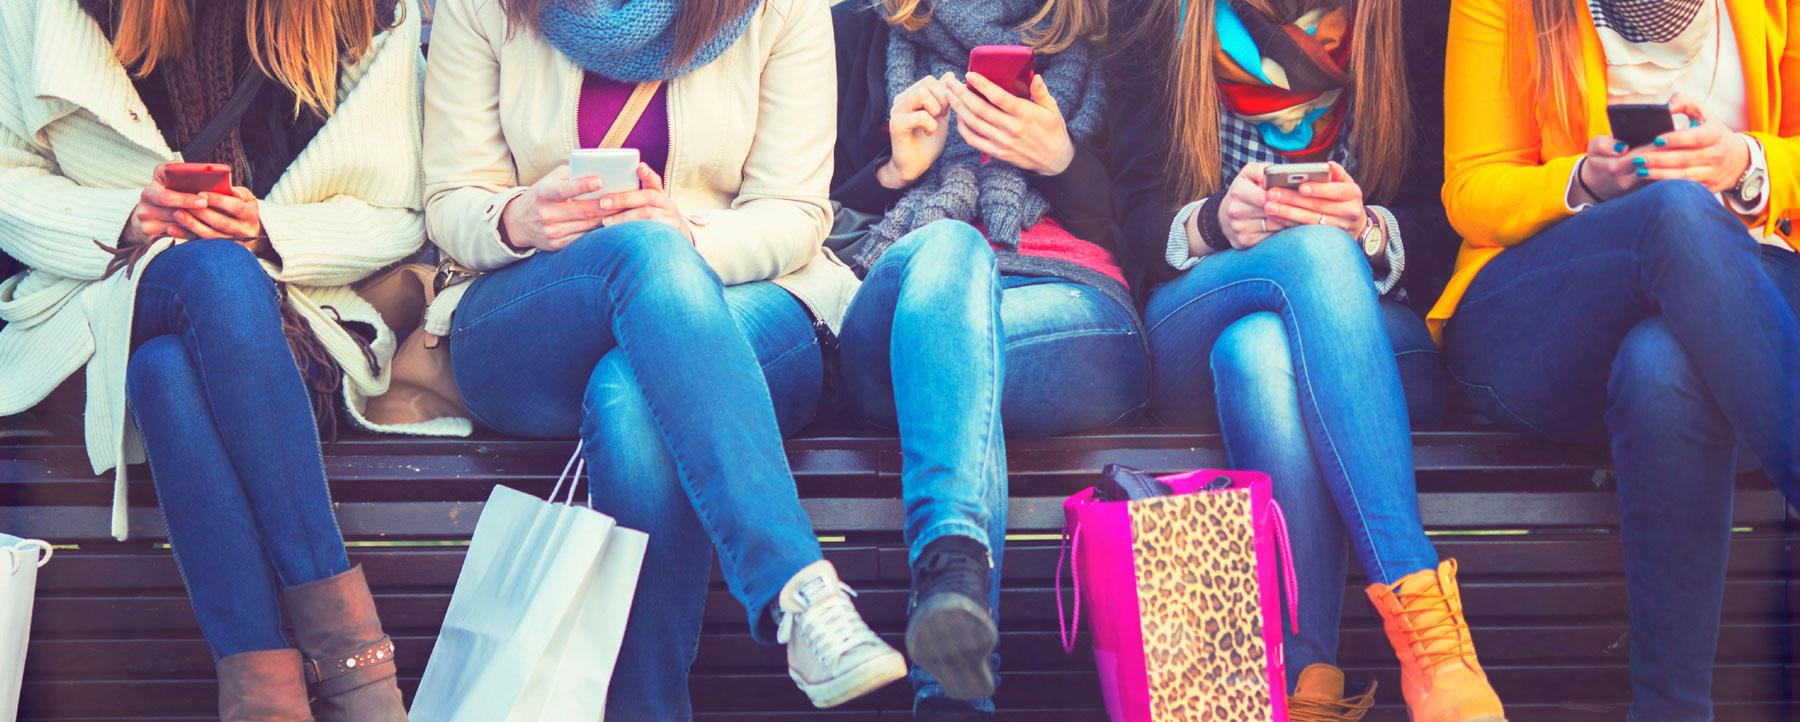 Group of friends using smartphones